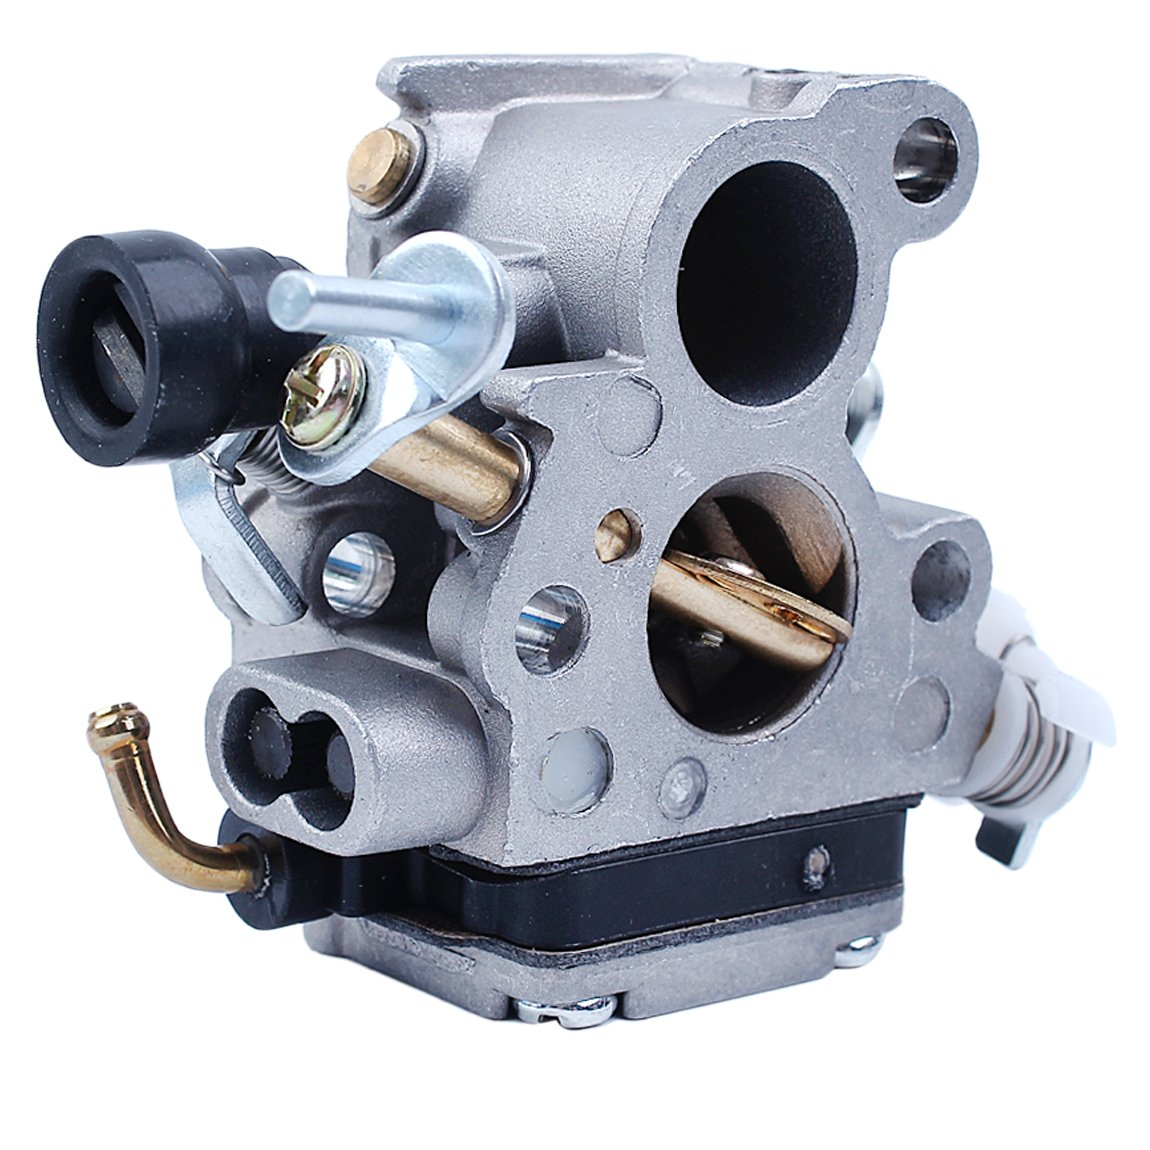 Haishine Carburetor Carb Gasket Fit Husqvarna 435 440 e 435e 440e Chainsaw Replace Zama C1T-EL41#506 45 05-01